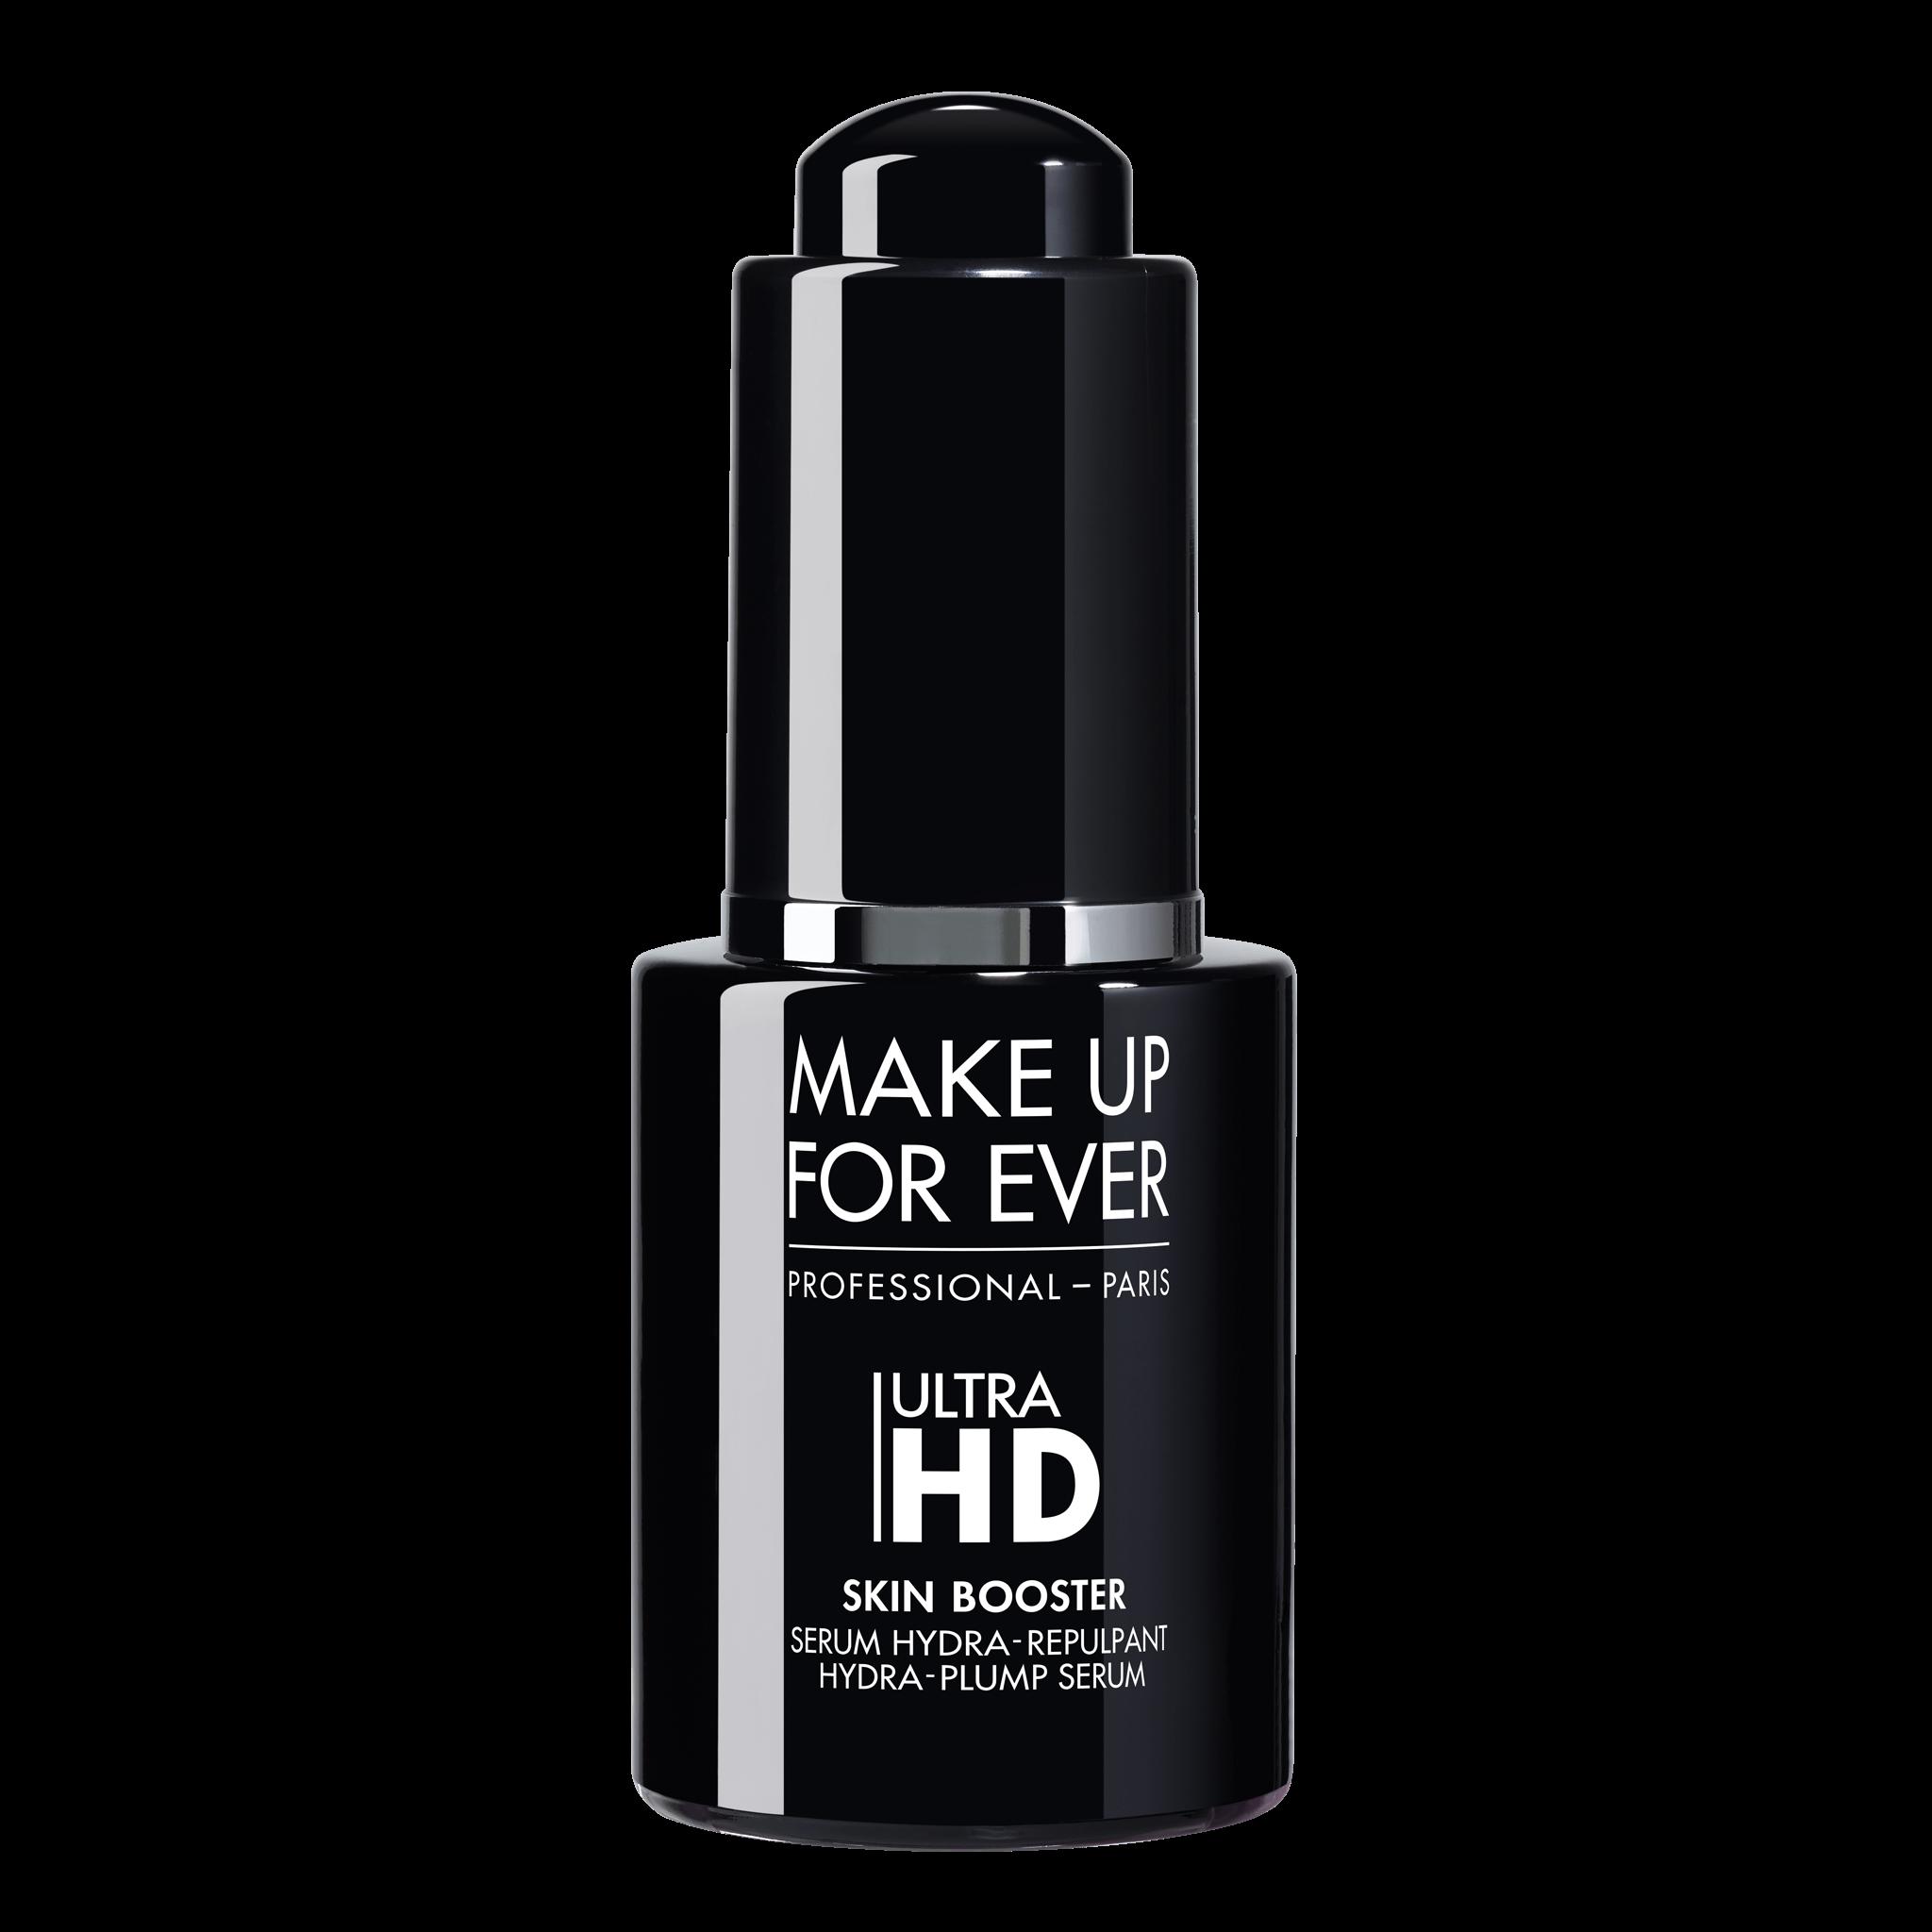 Mist & Fix Makeup Setting Spray Safety 1st Makeup